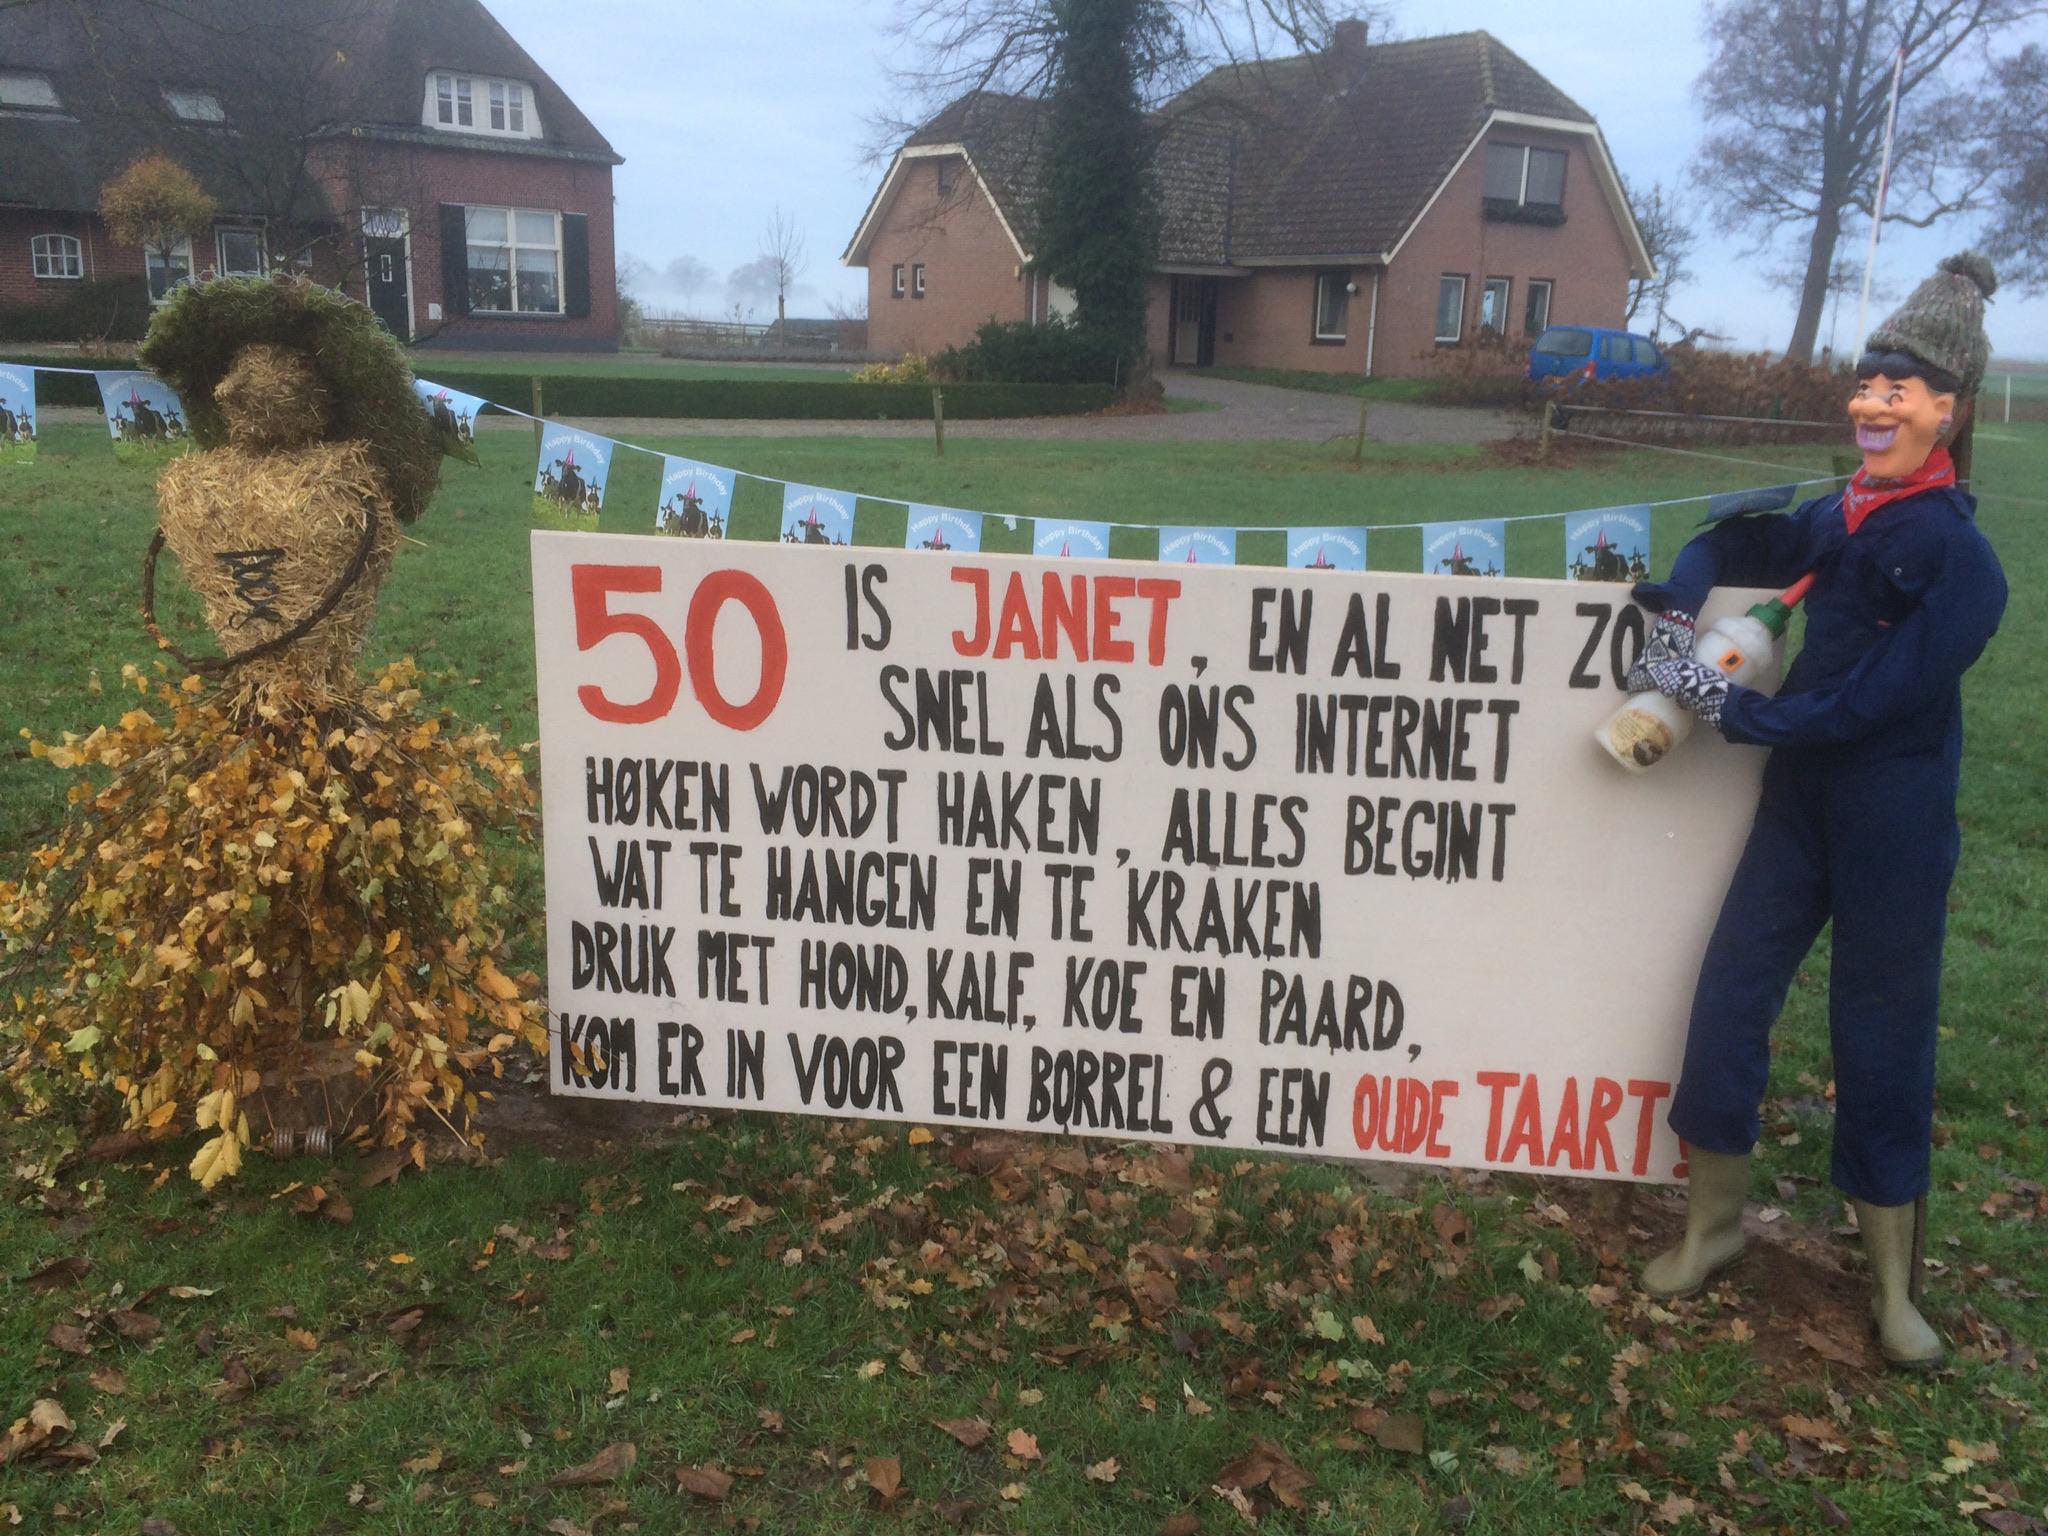 Janet Heilersig Ontmoet Sarah Maarkelsnieuwsnl